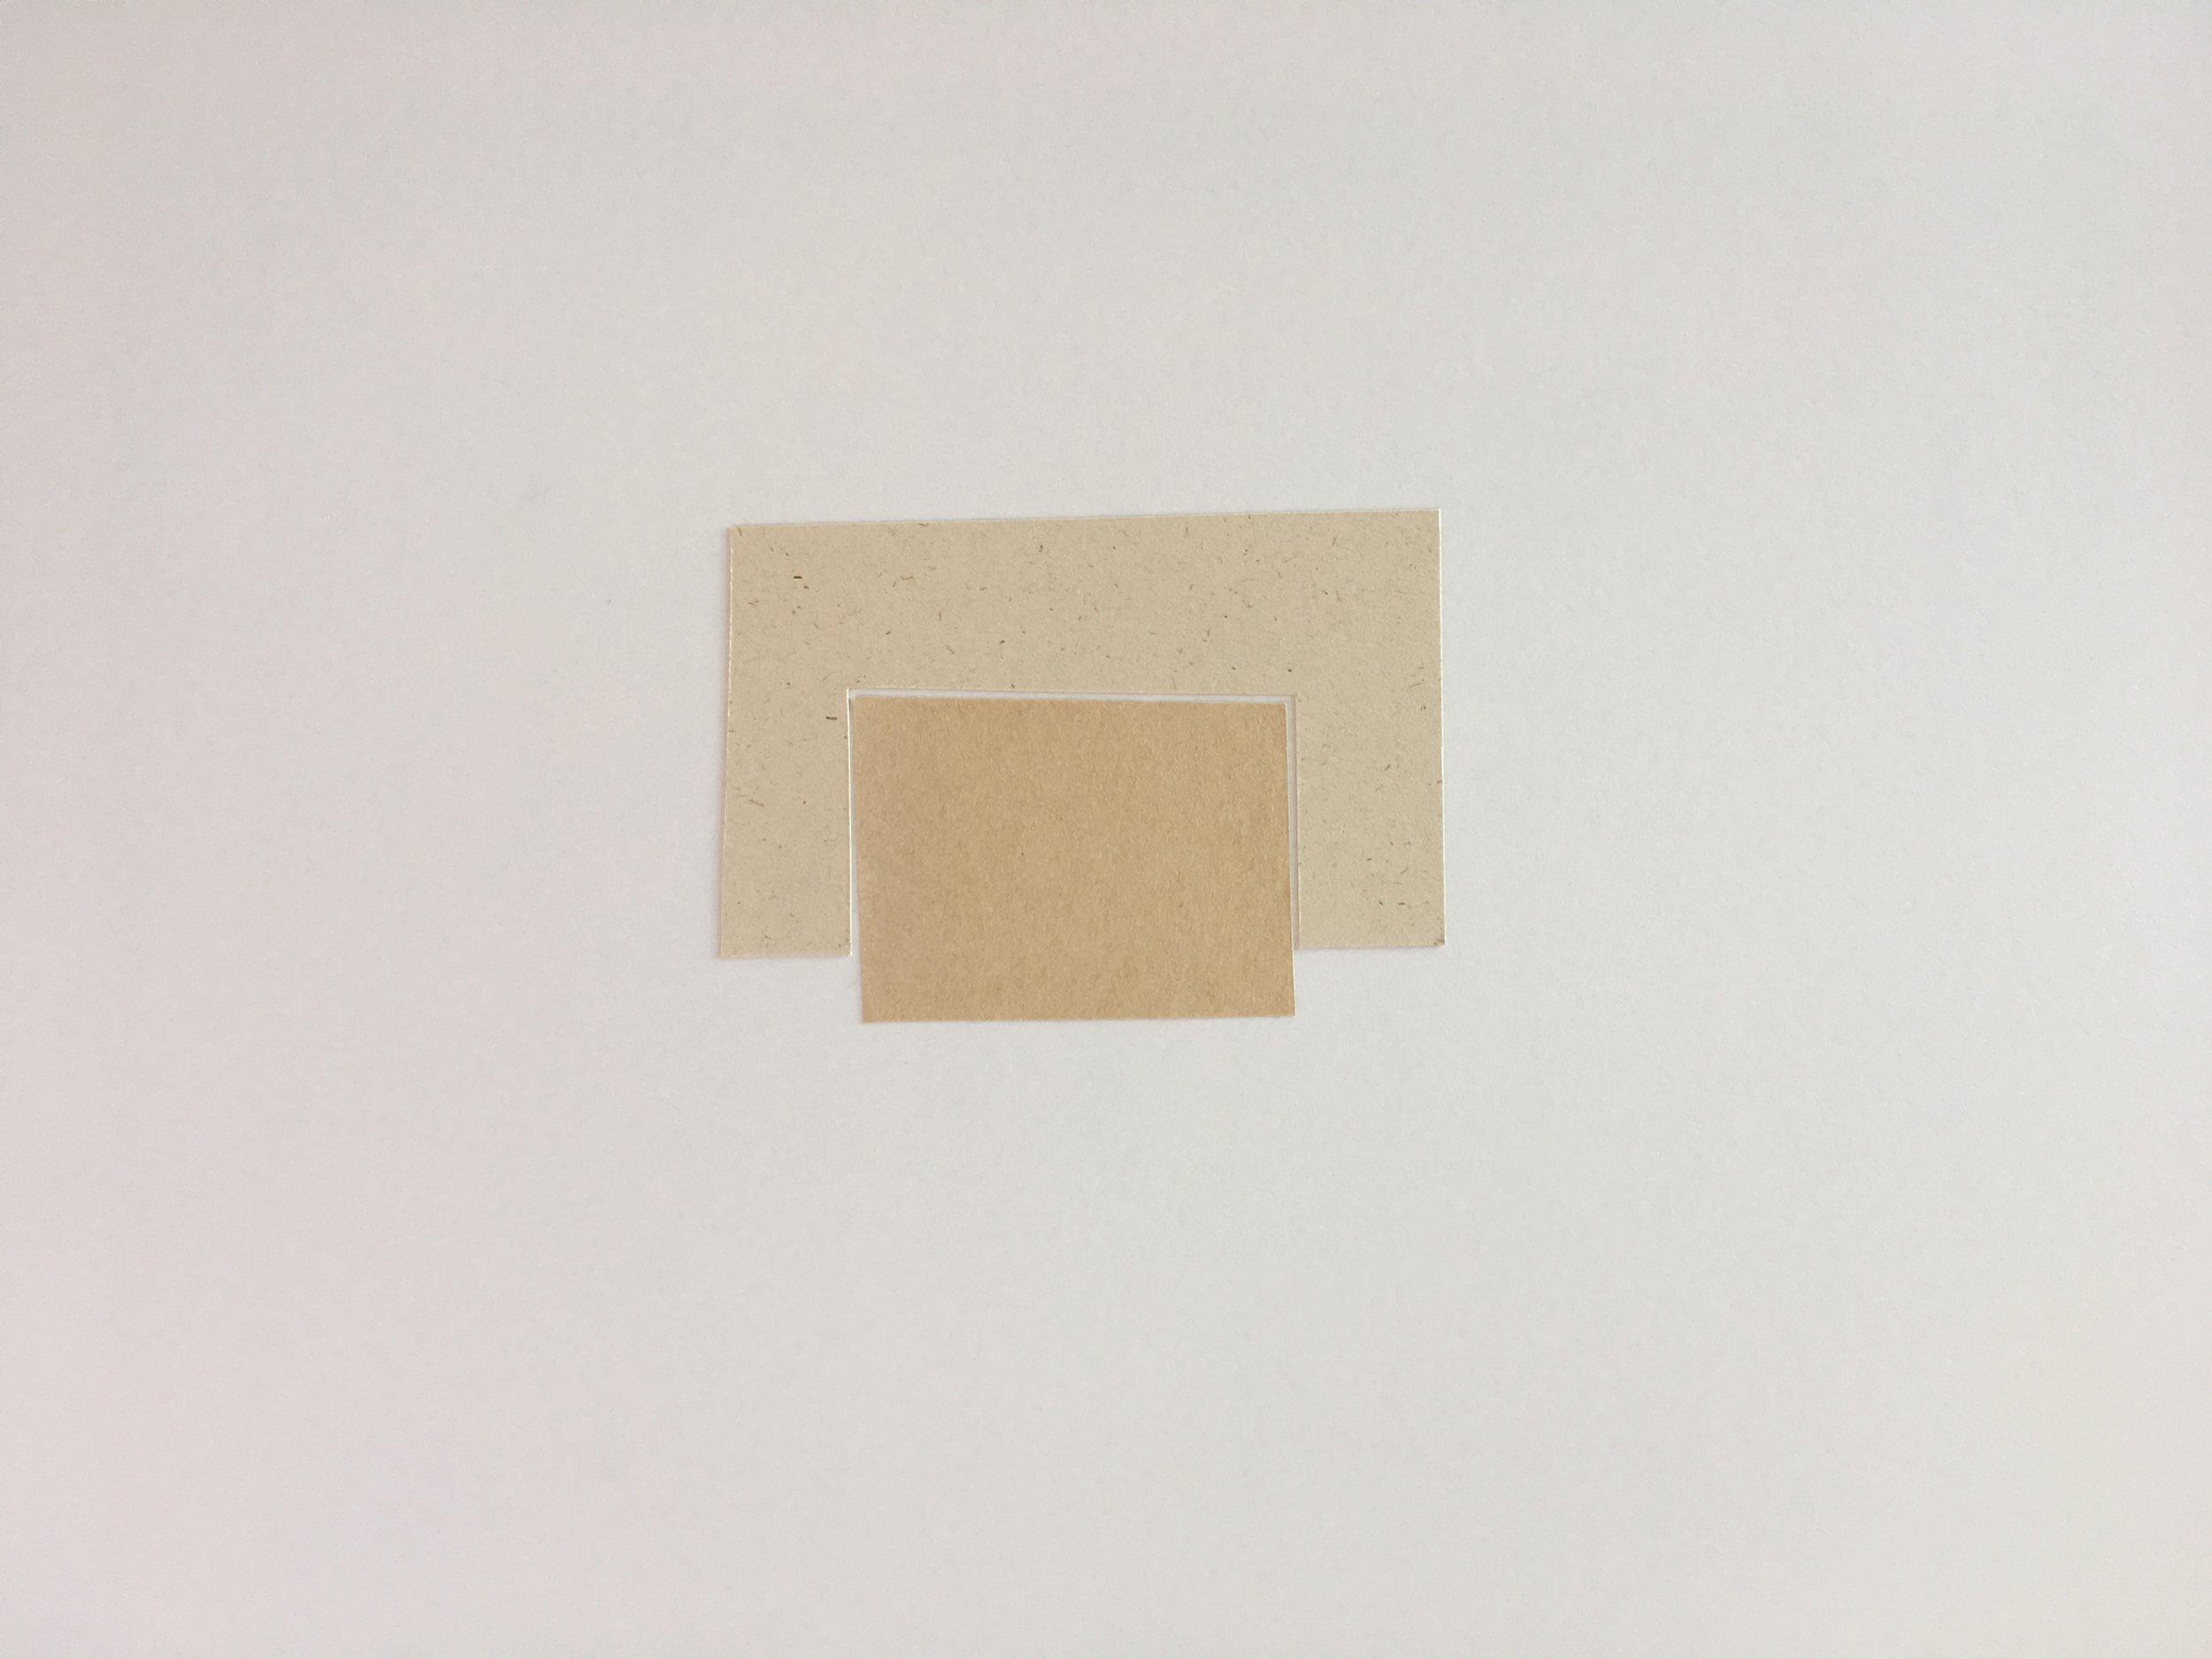 Homesick , 1:8, Paper On Paper, 36 x 28 cm, 2019.JPG